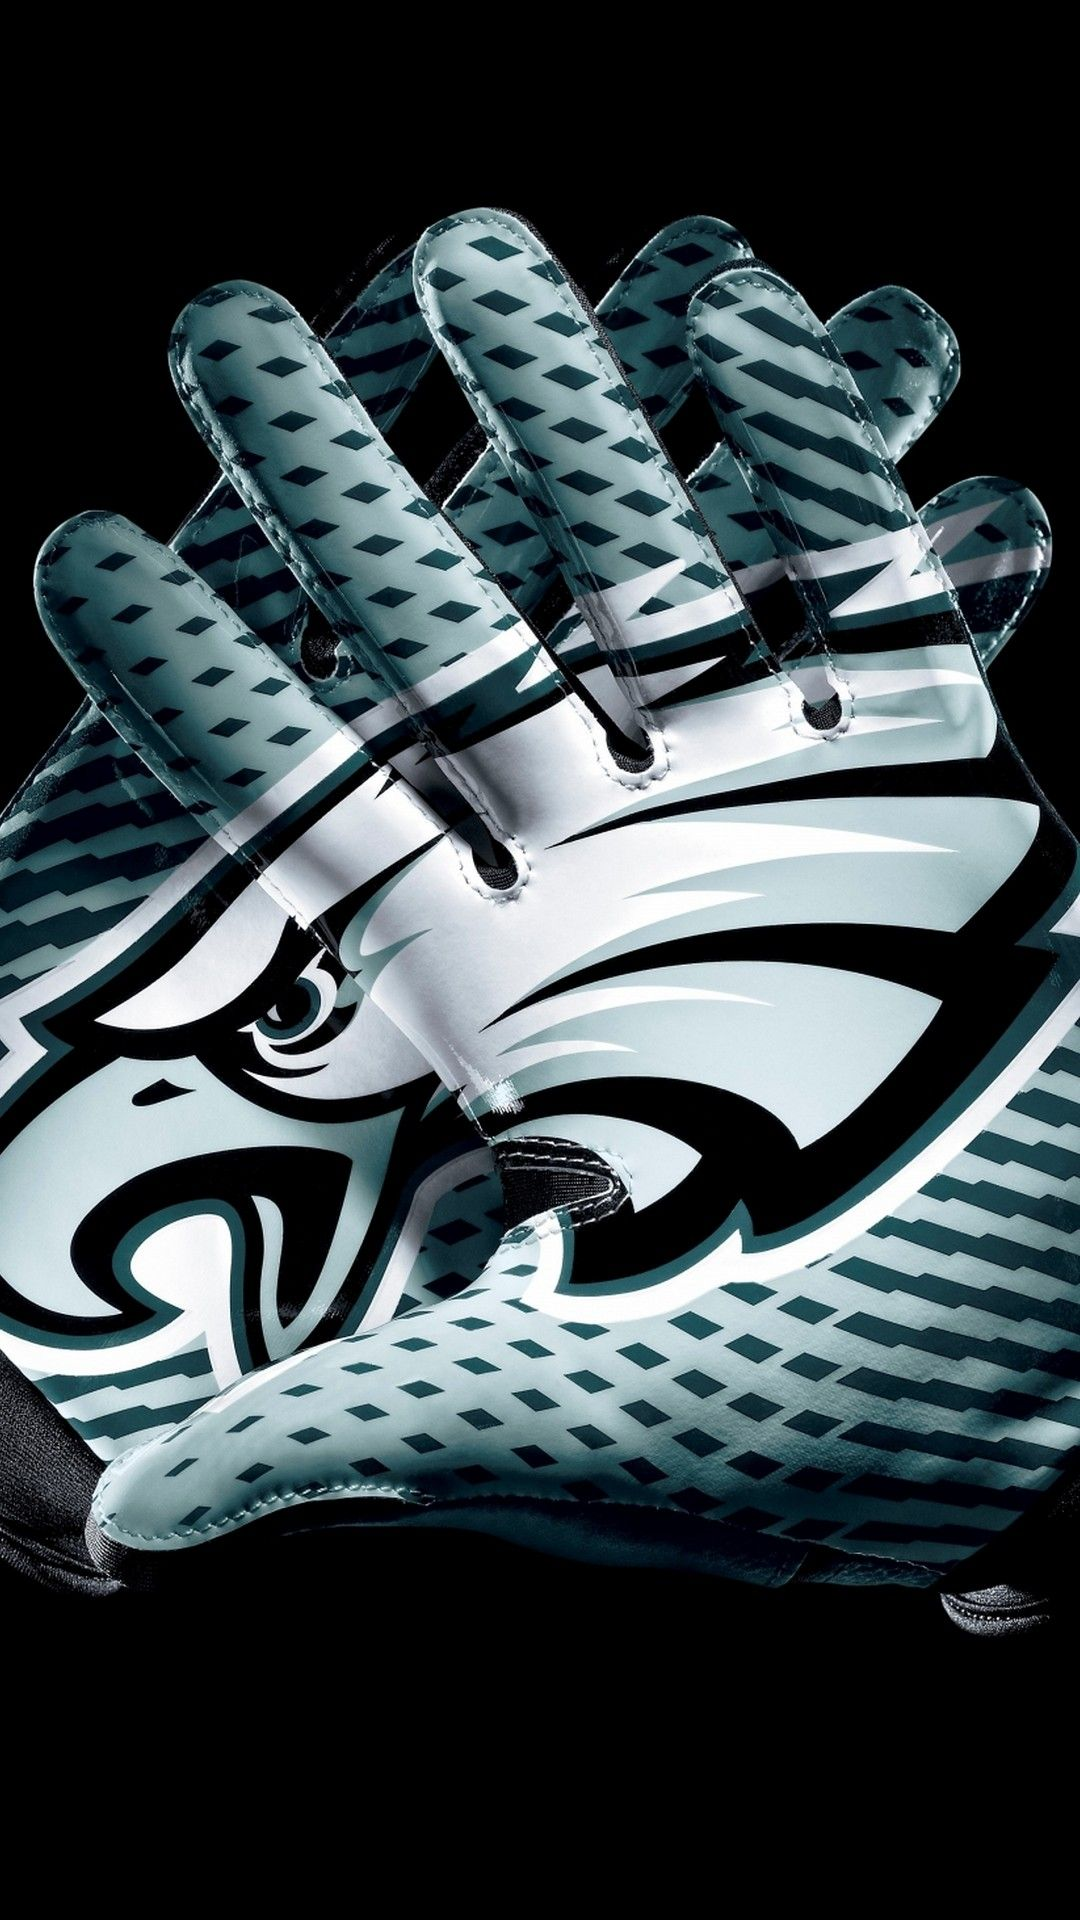 Wallpaper Philadelphia Eagles iPhone Philadelphia eagles